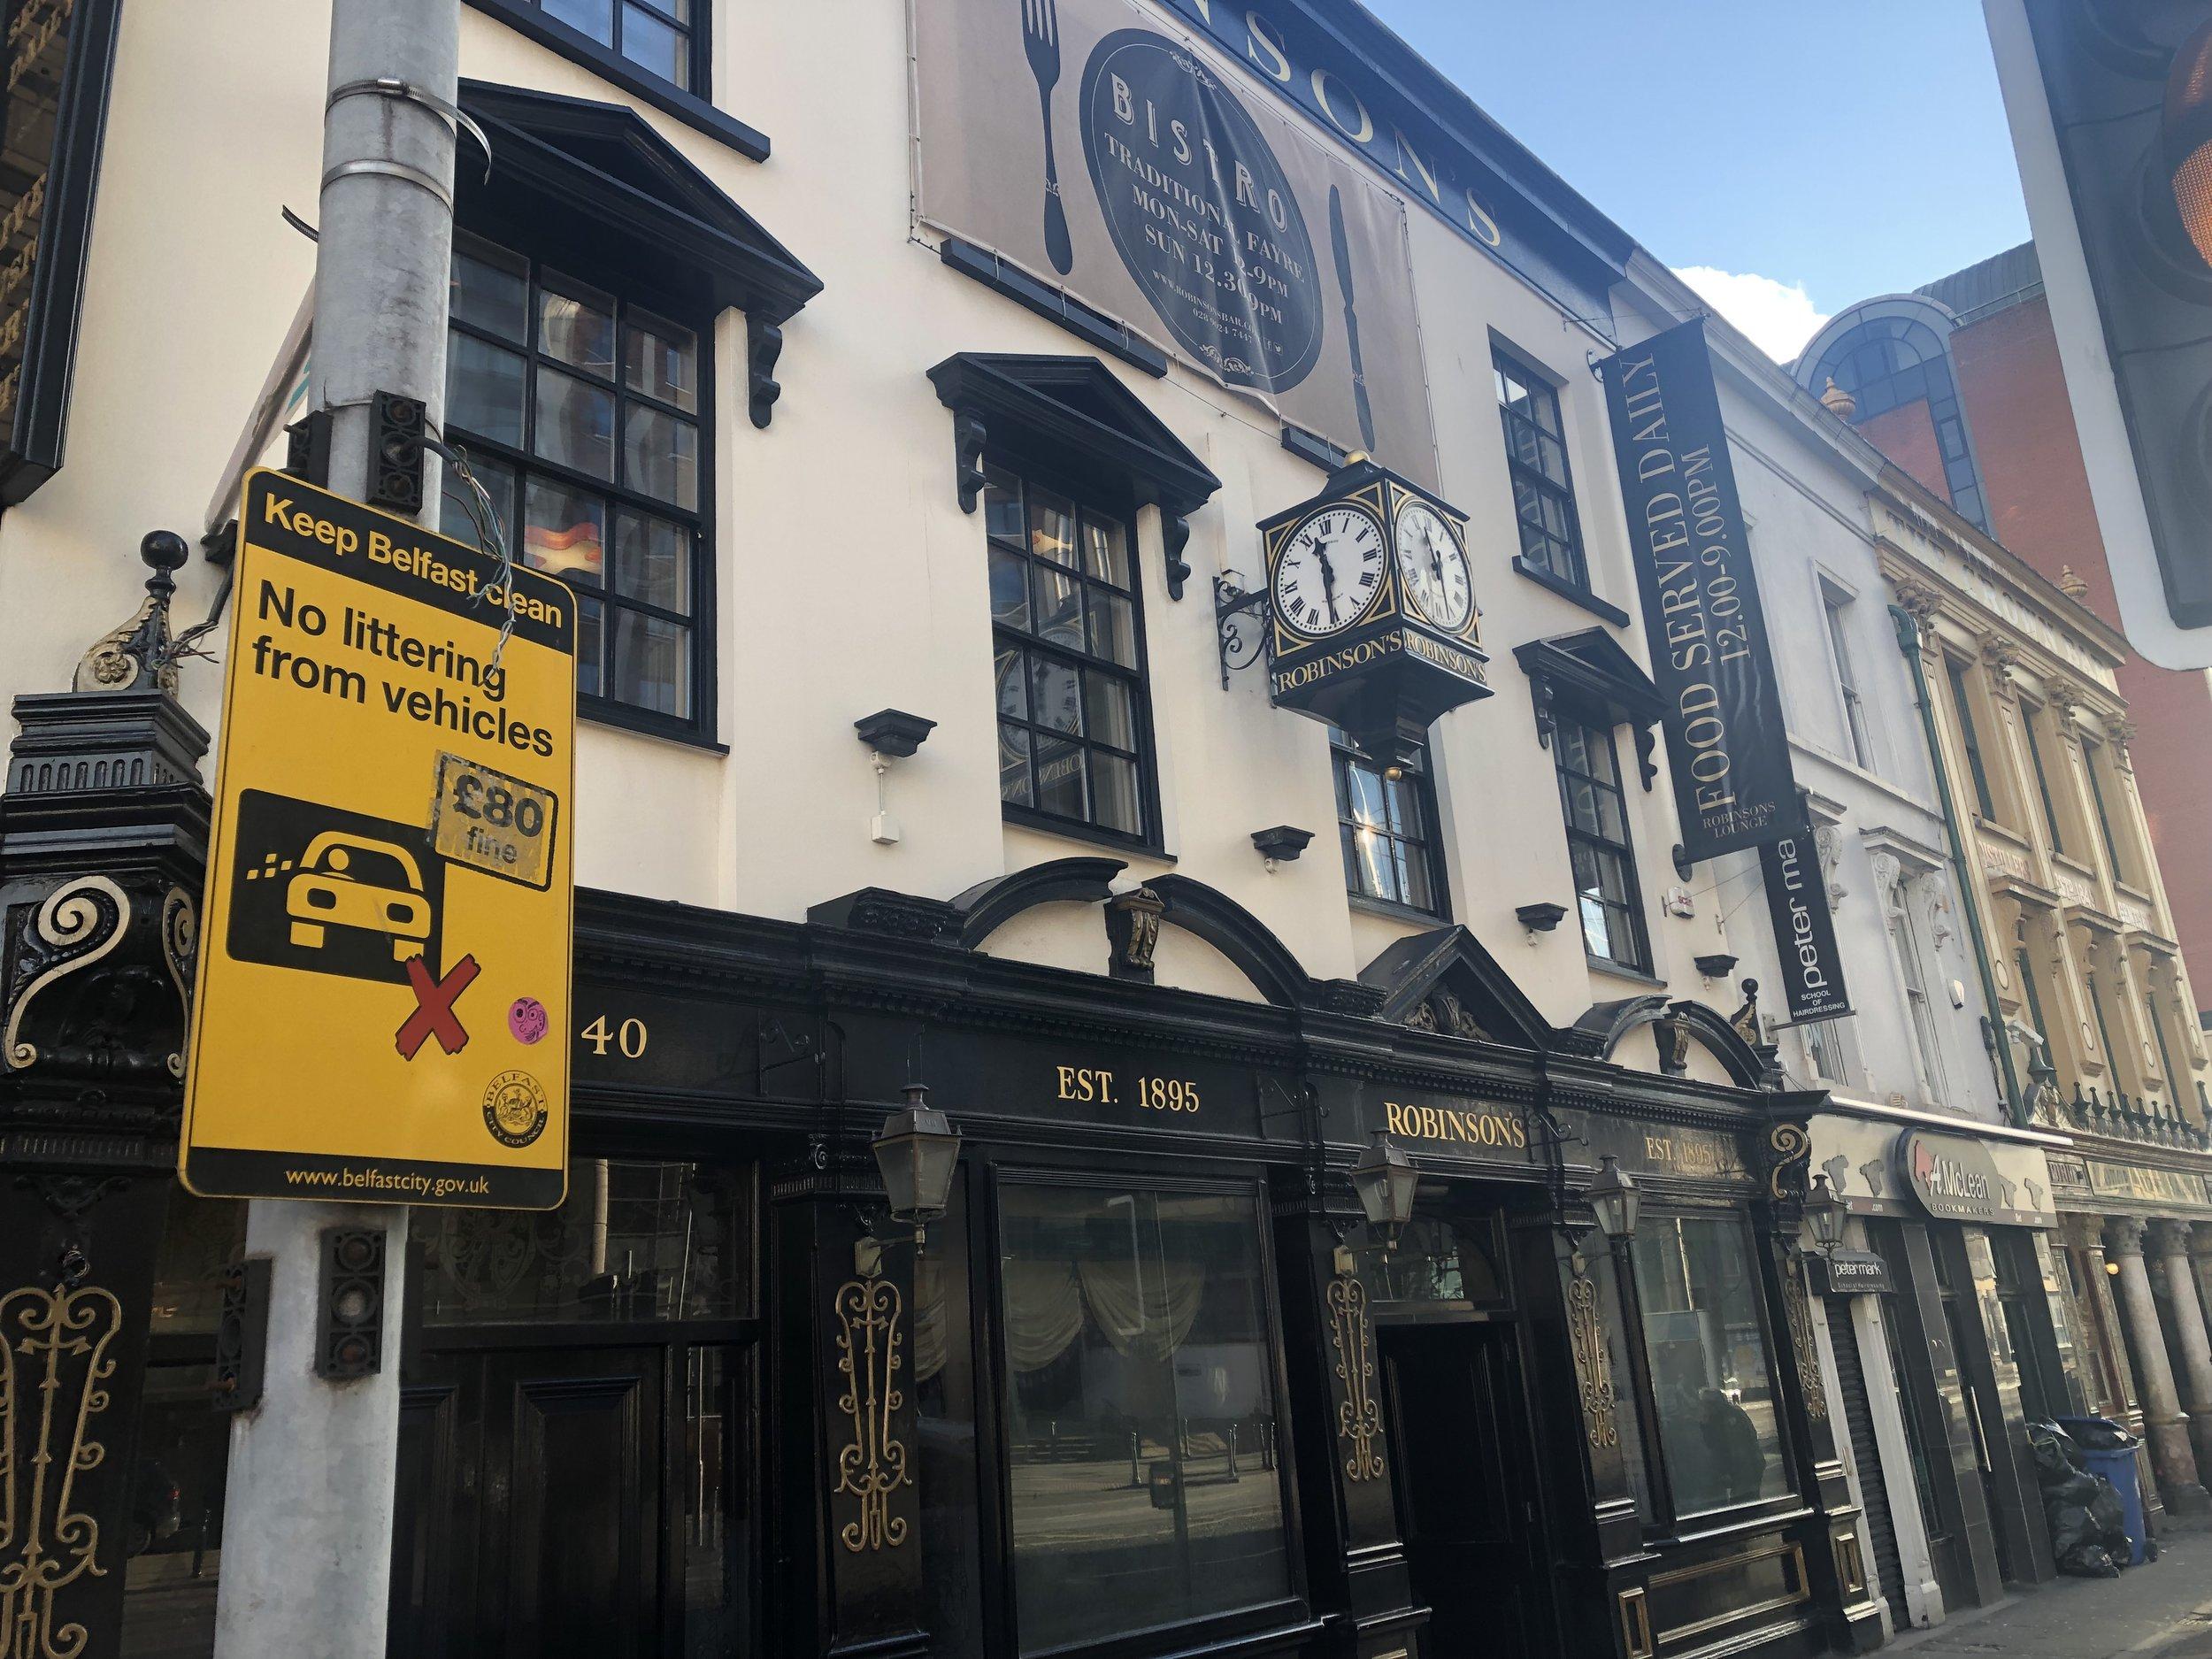 We basically pub crawled through Belfast, Northern Ireland.